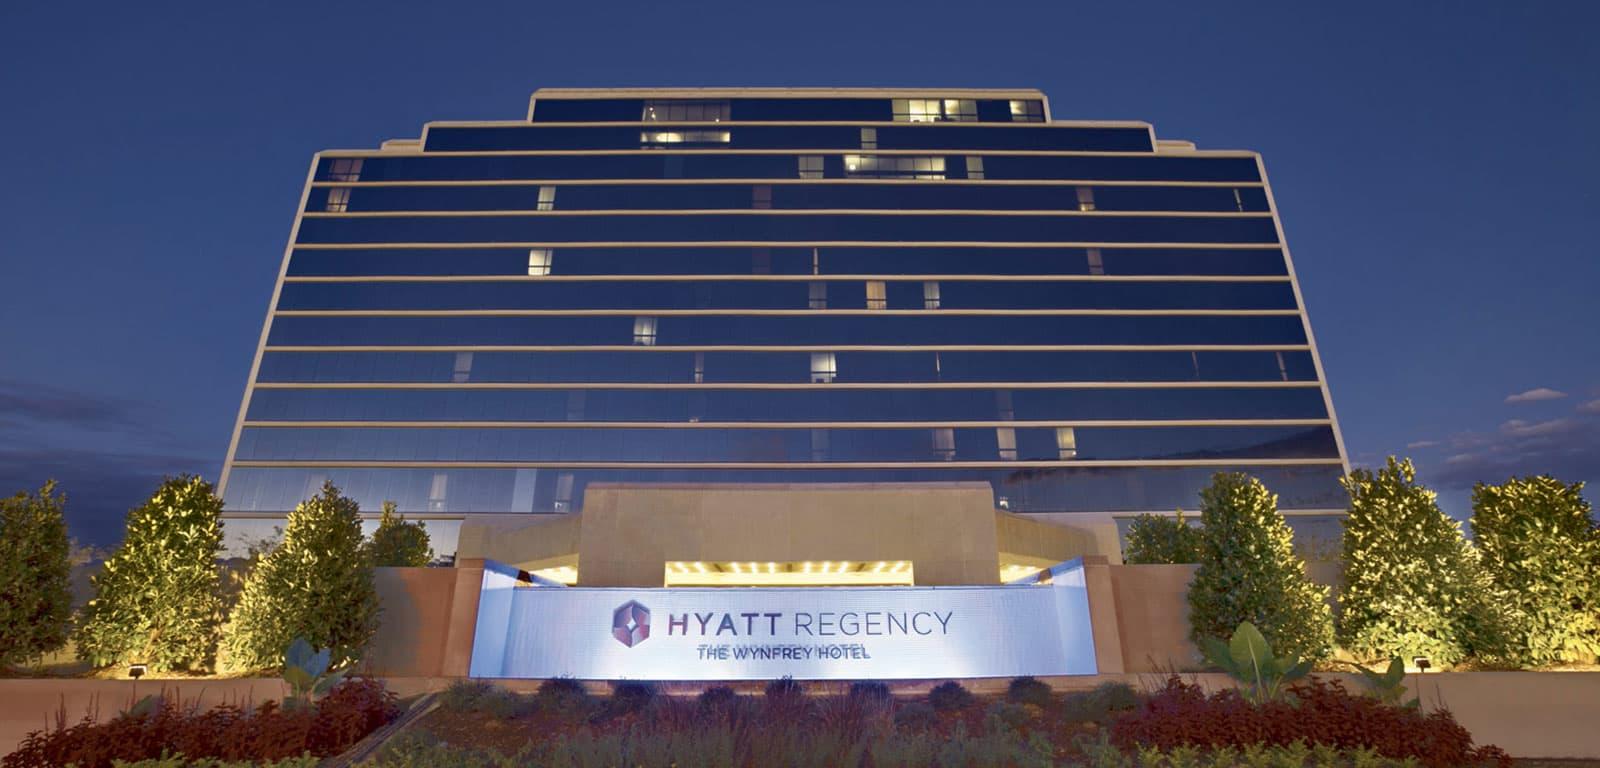 Exterior Shot of The Wynfrey Hotel - Hyatt Regency in Birmingham, Atlanta